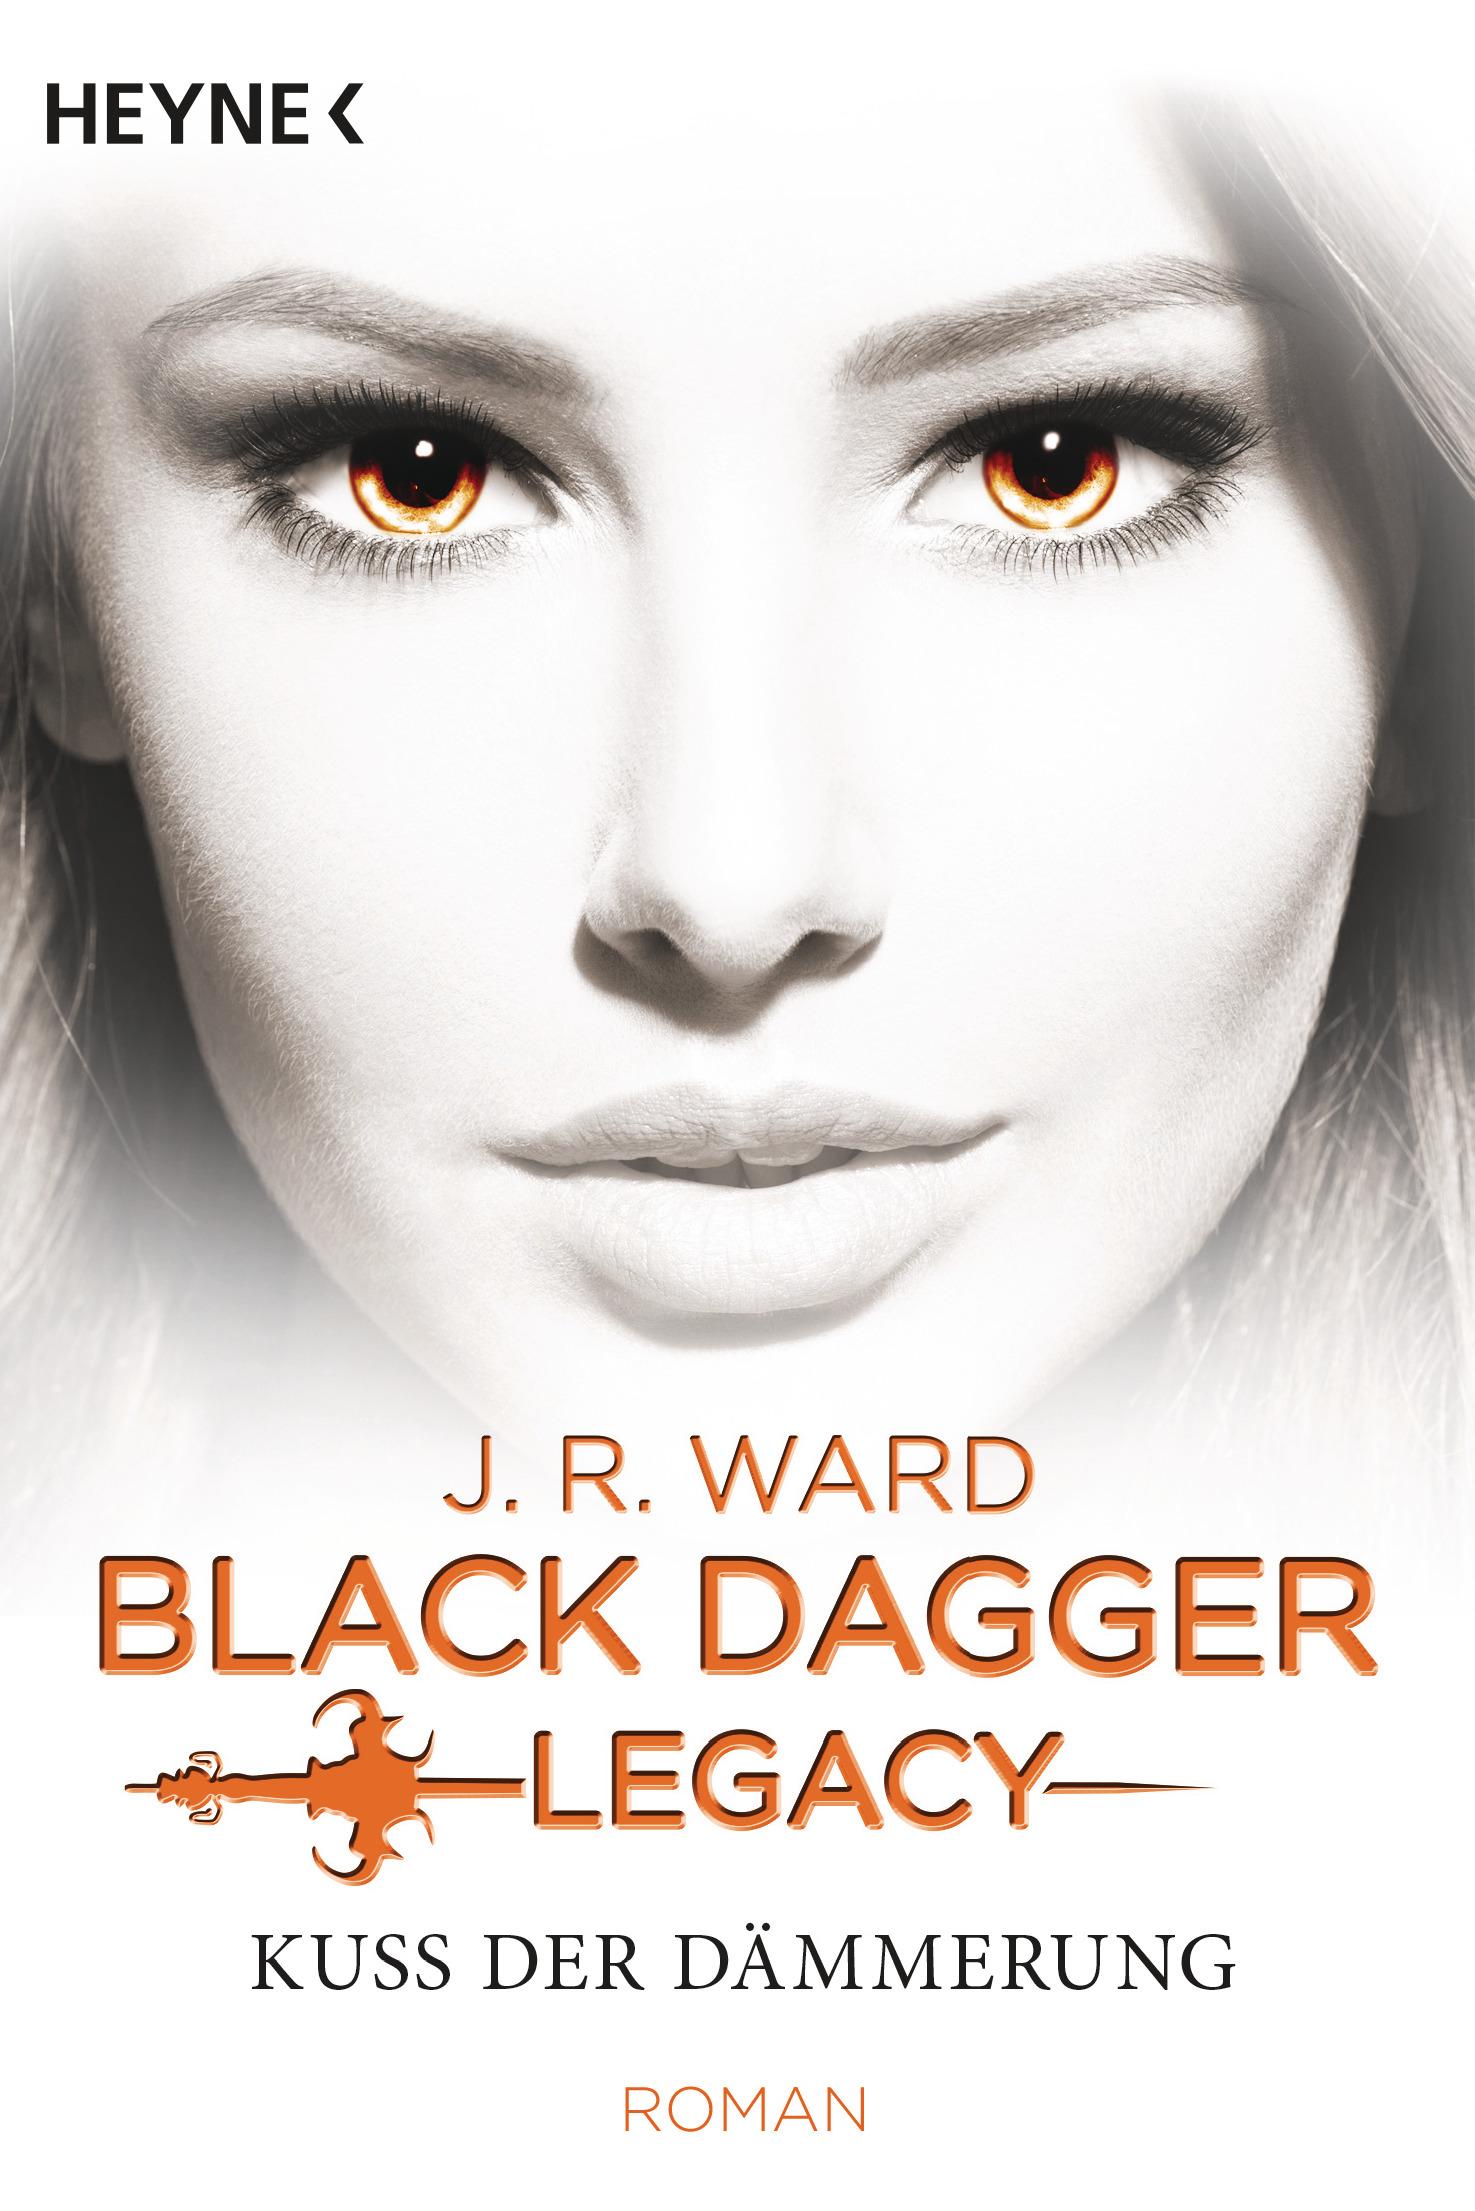 J.R. Ward: Black Dagger Legacy - Kuss der Dämmerung